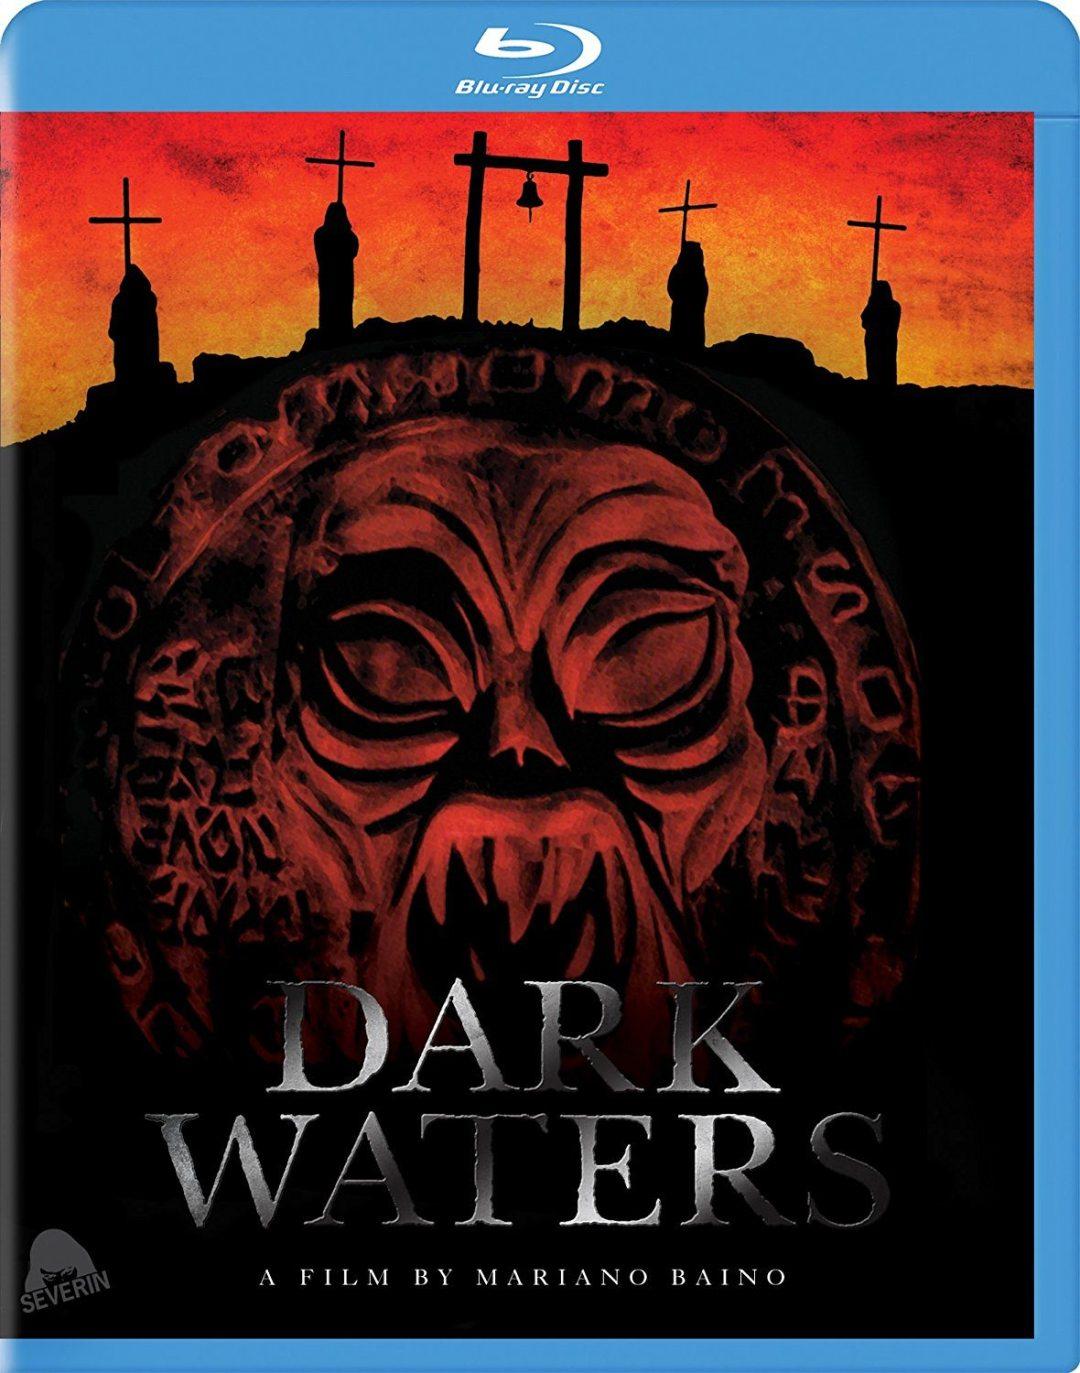 Dark Waters – Blu-ray/DVD Review